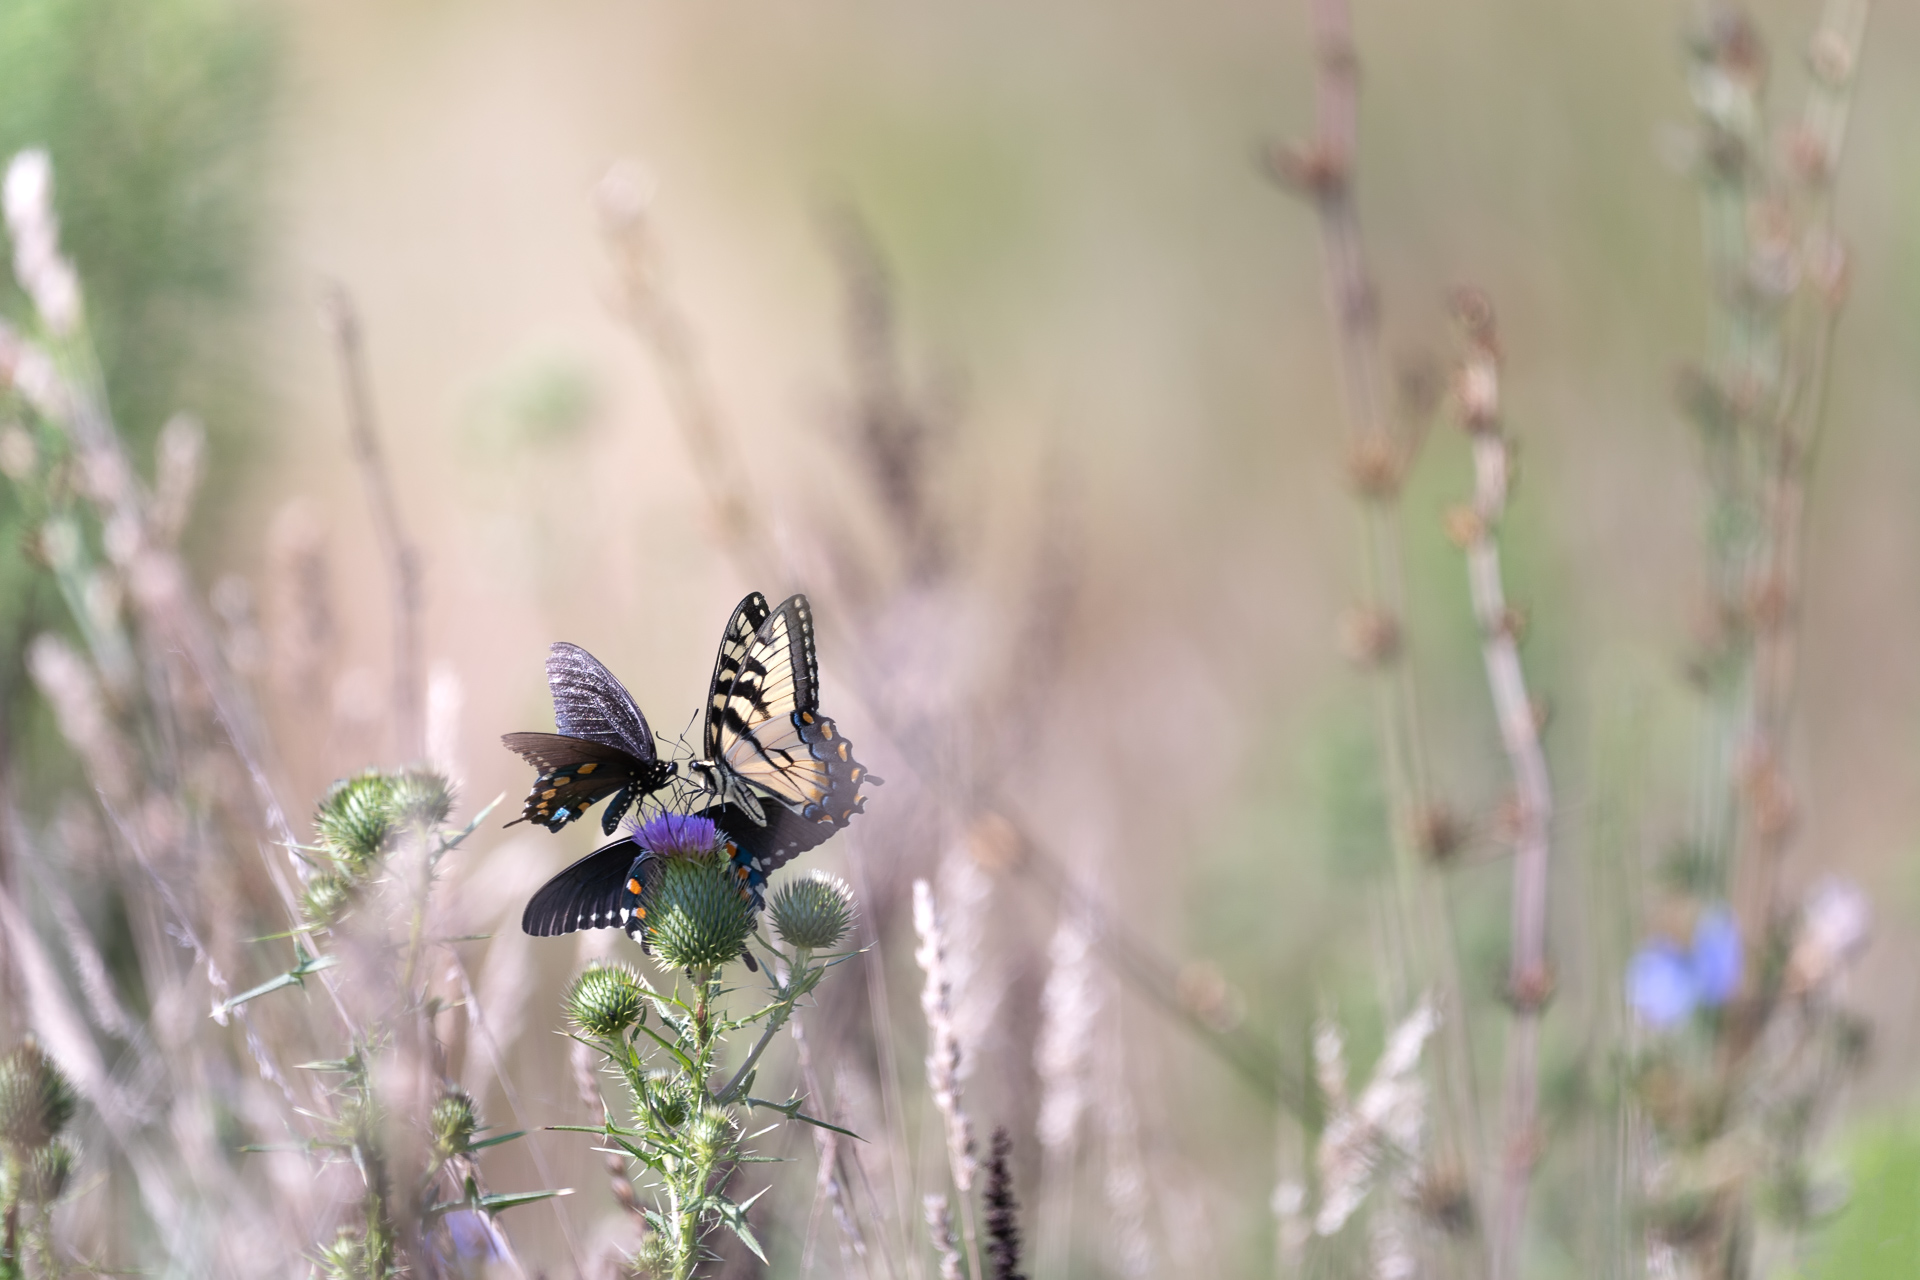 Butterflies-nature-Kathleen-Kathy-Roberts-Asheville-NC-Photographer-1.jpg